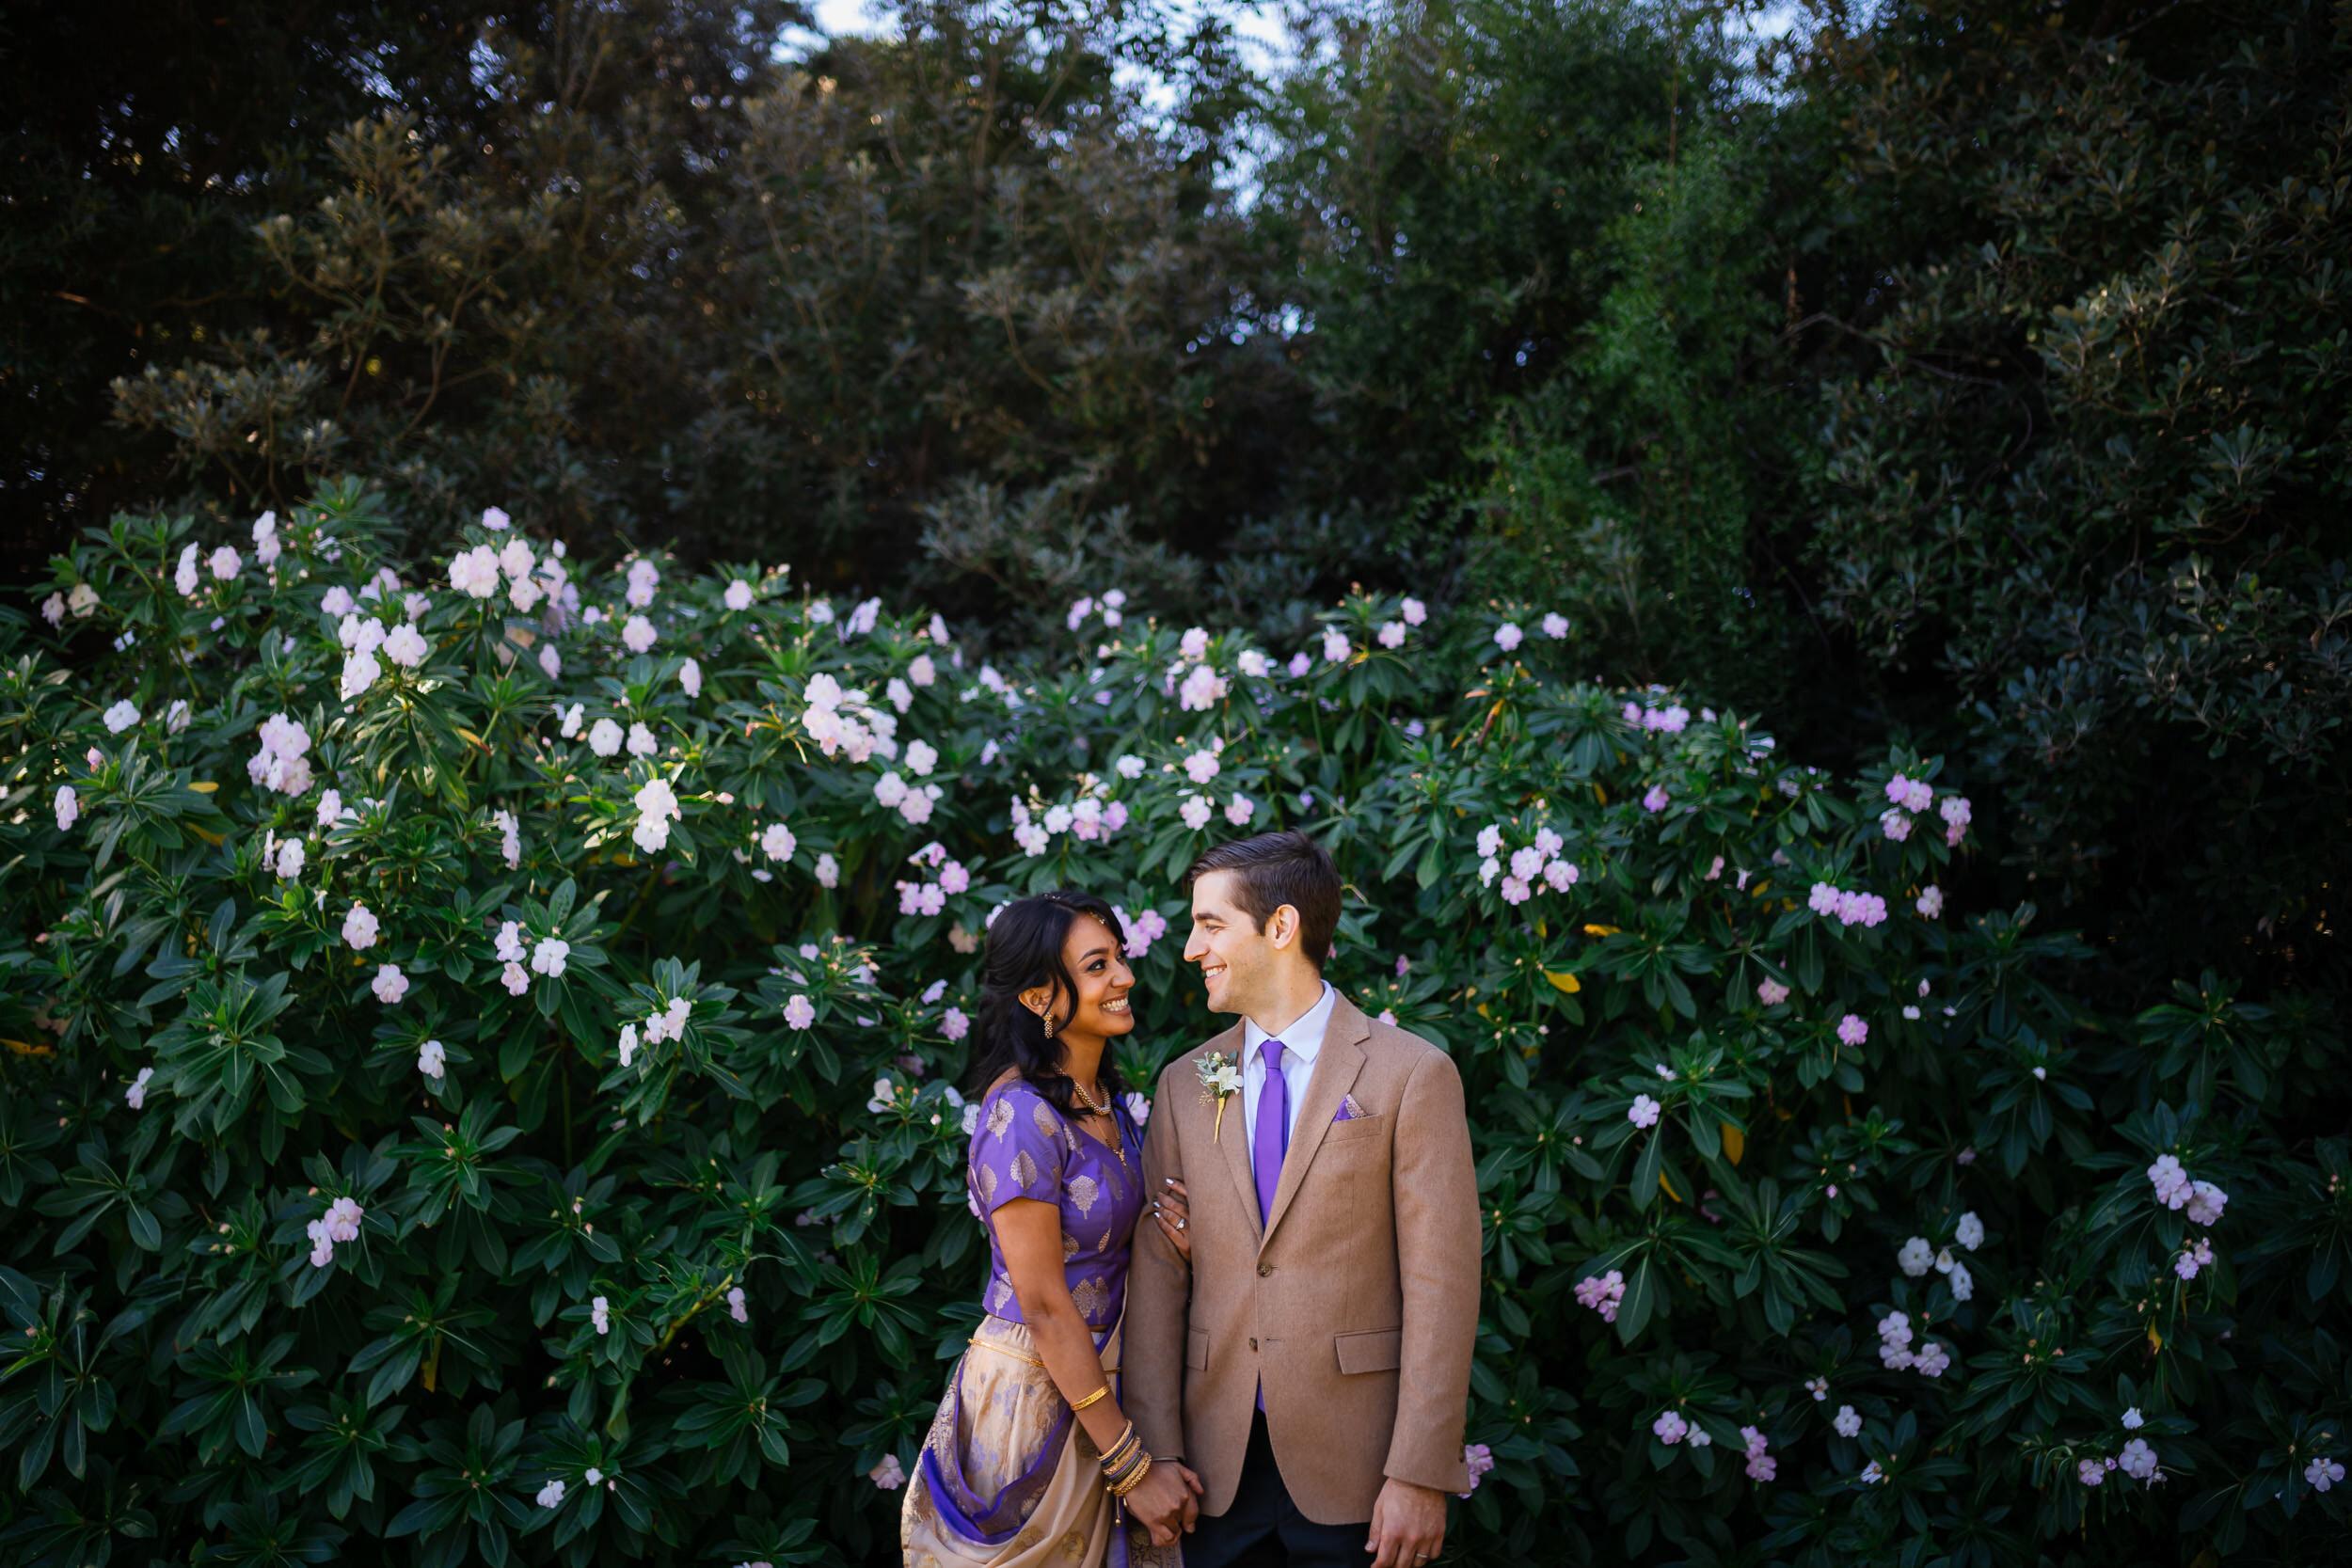 Bay Area Wedding Photographer - Trung Hoang Photography